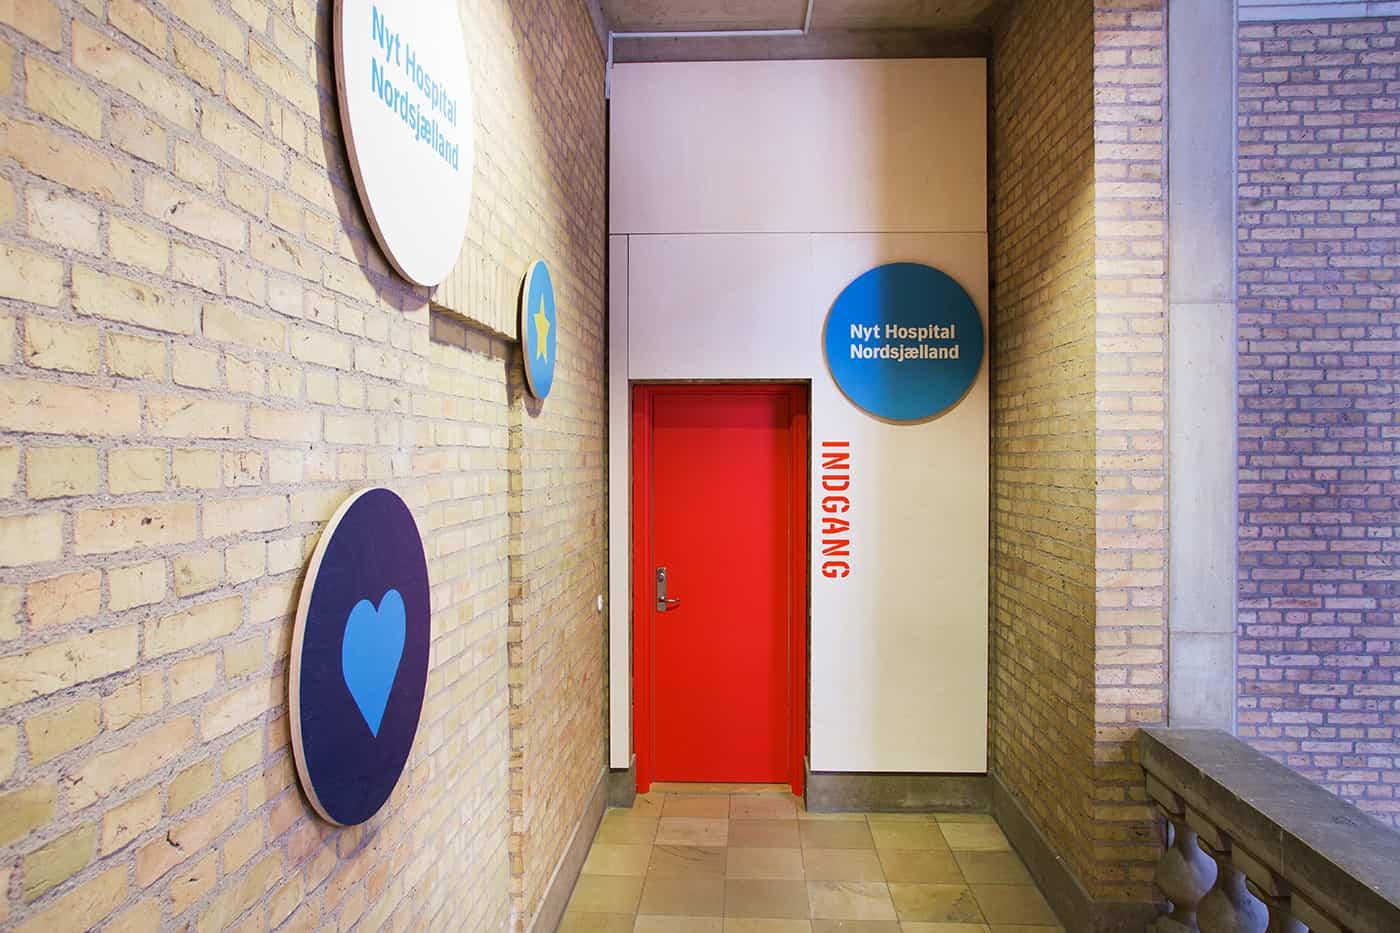 RITAarch, indretning, spaceplanning, grafik, indgang, visuelidentitet, Nyt hospital Nordsjælland projekthus